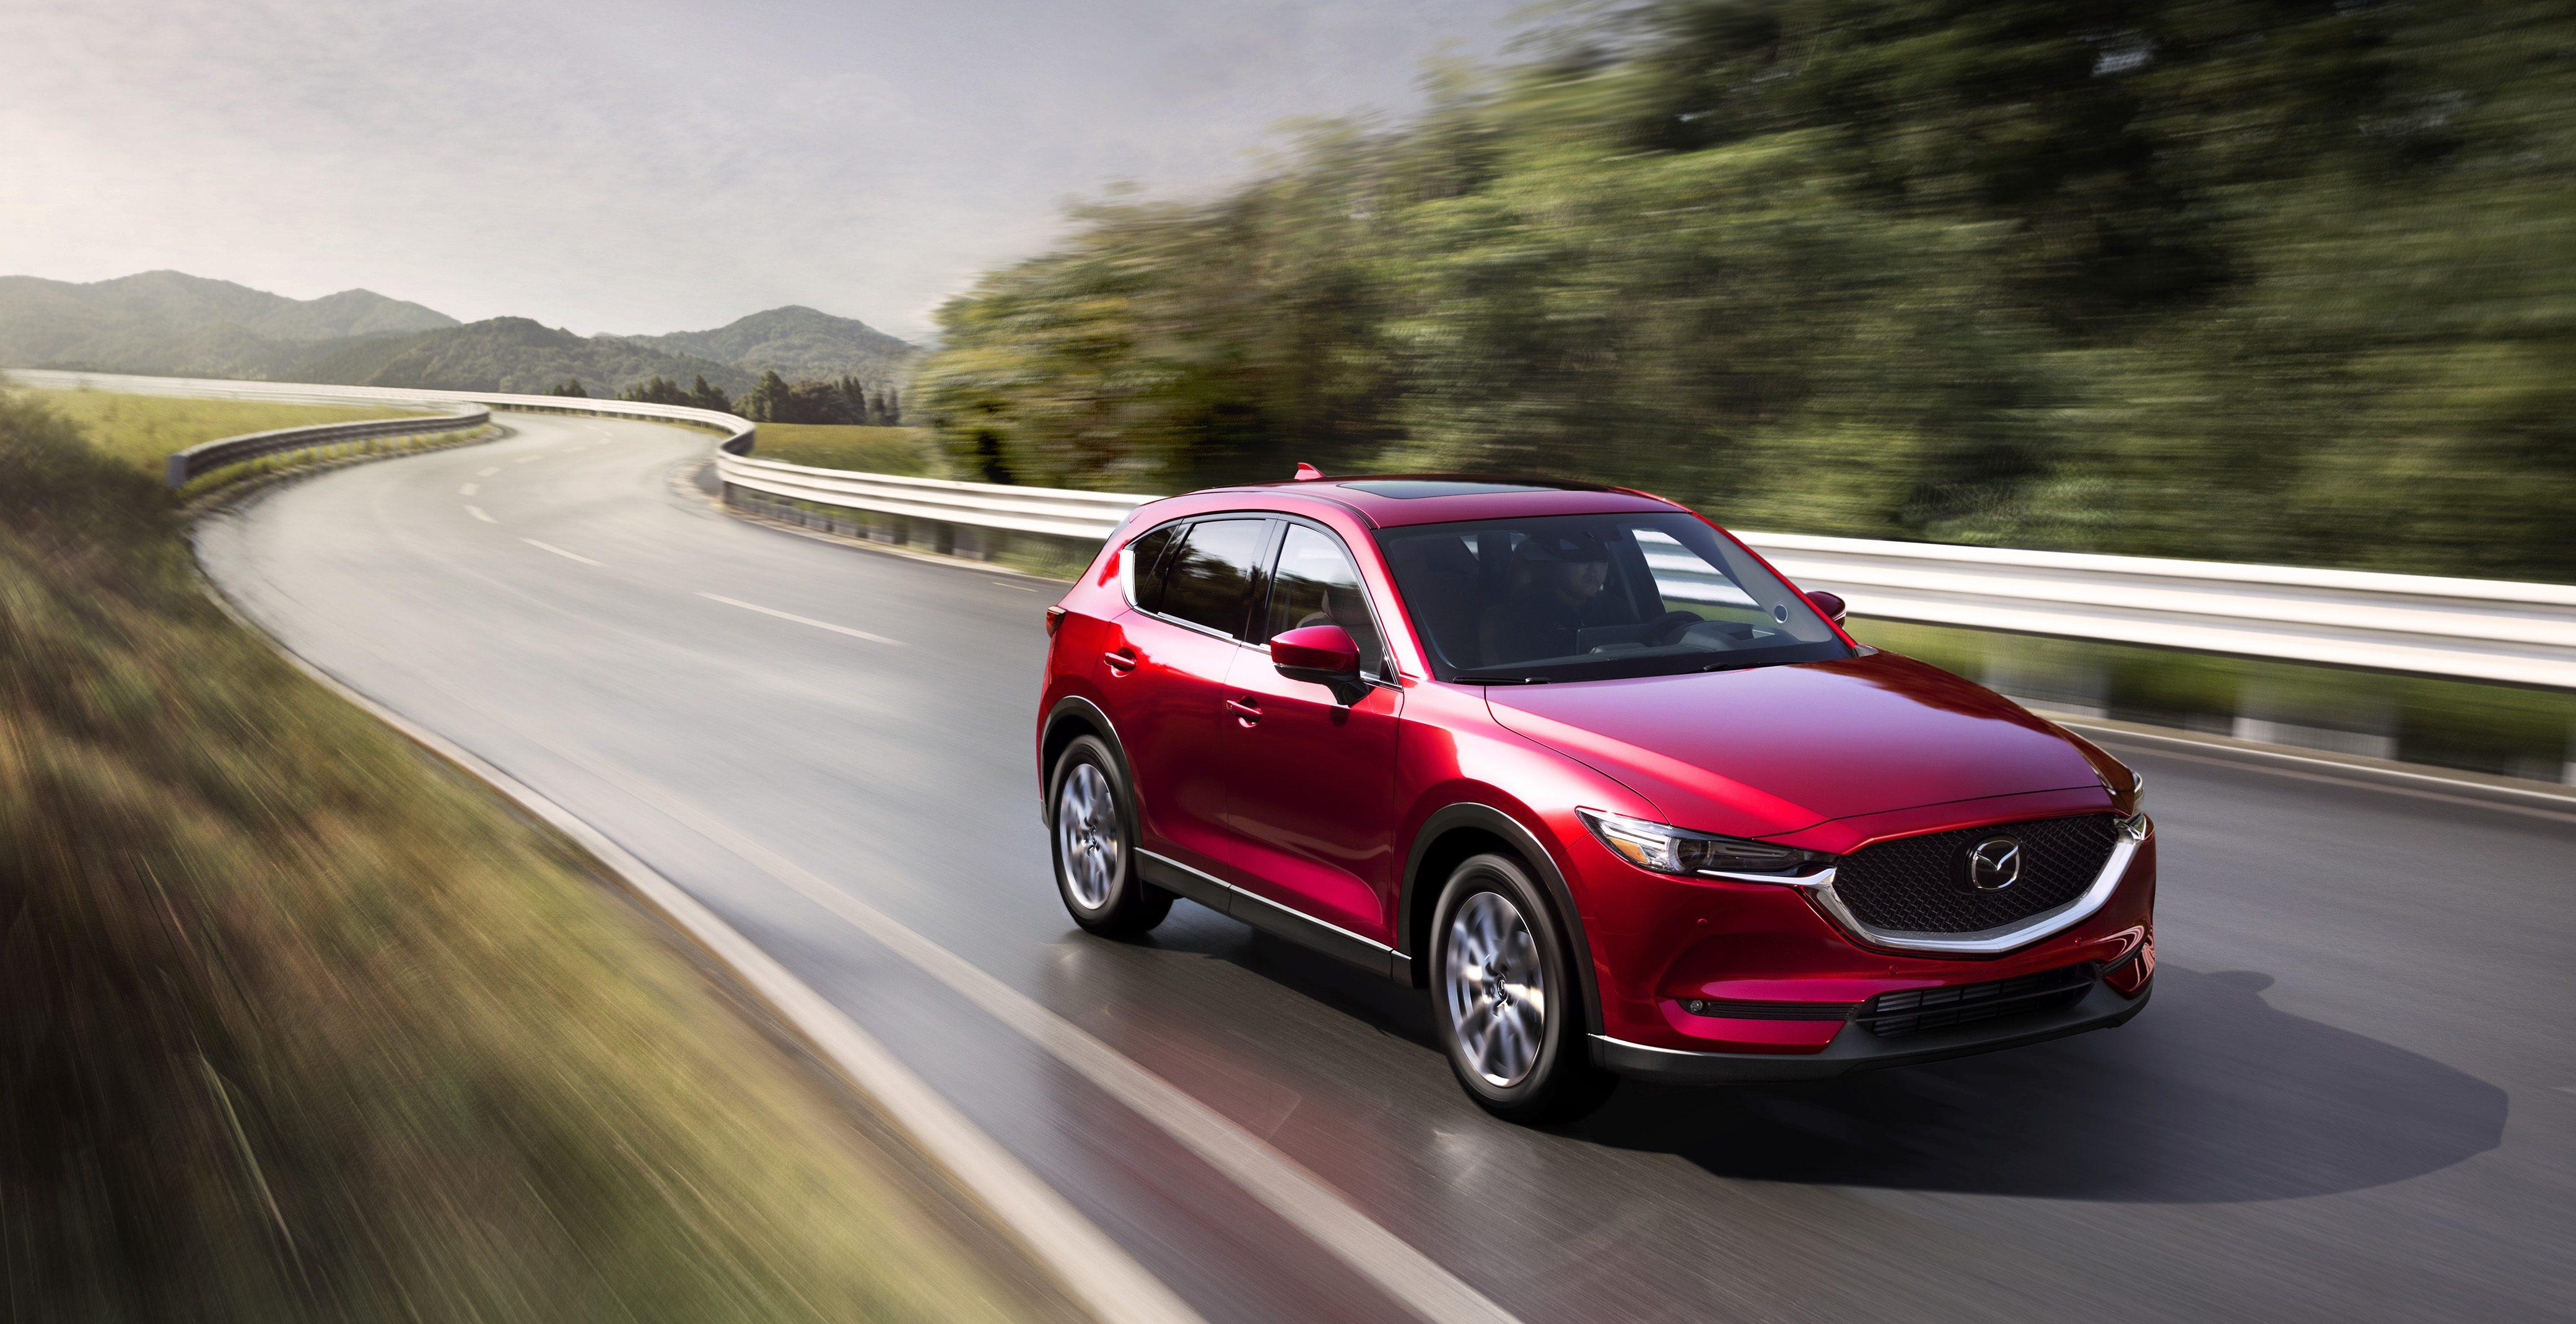 Can The Mazda CX-5 Tow a Camper Trailer?